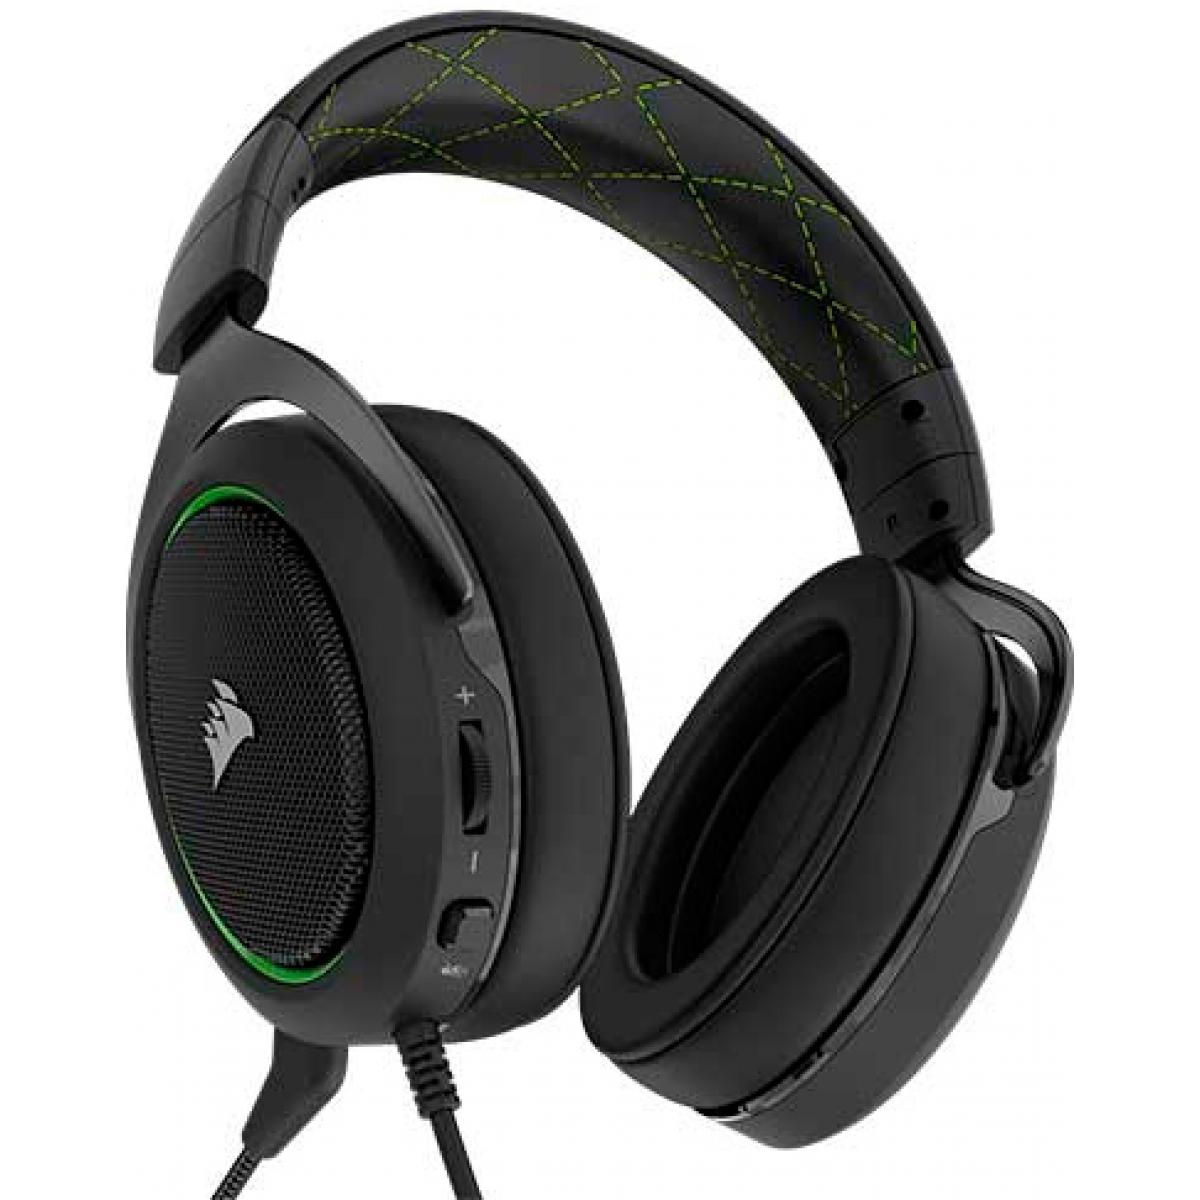 Headset Gamer Corsair HS50 Stereo Green CA-9011171-NA